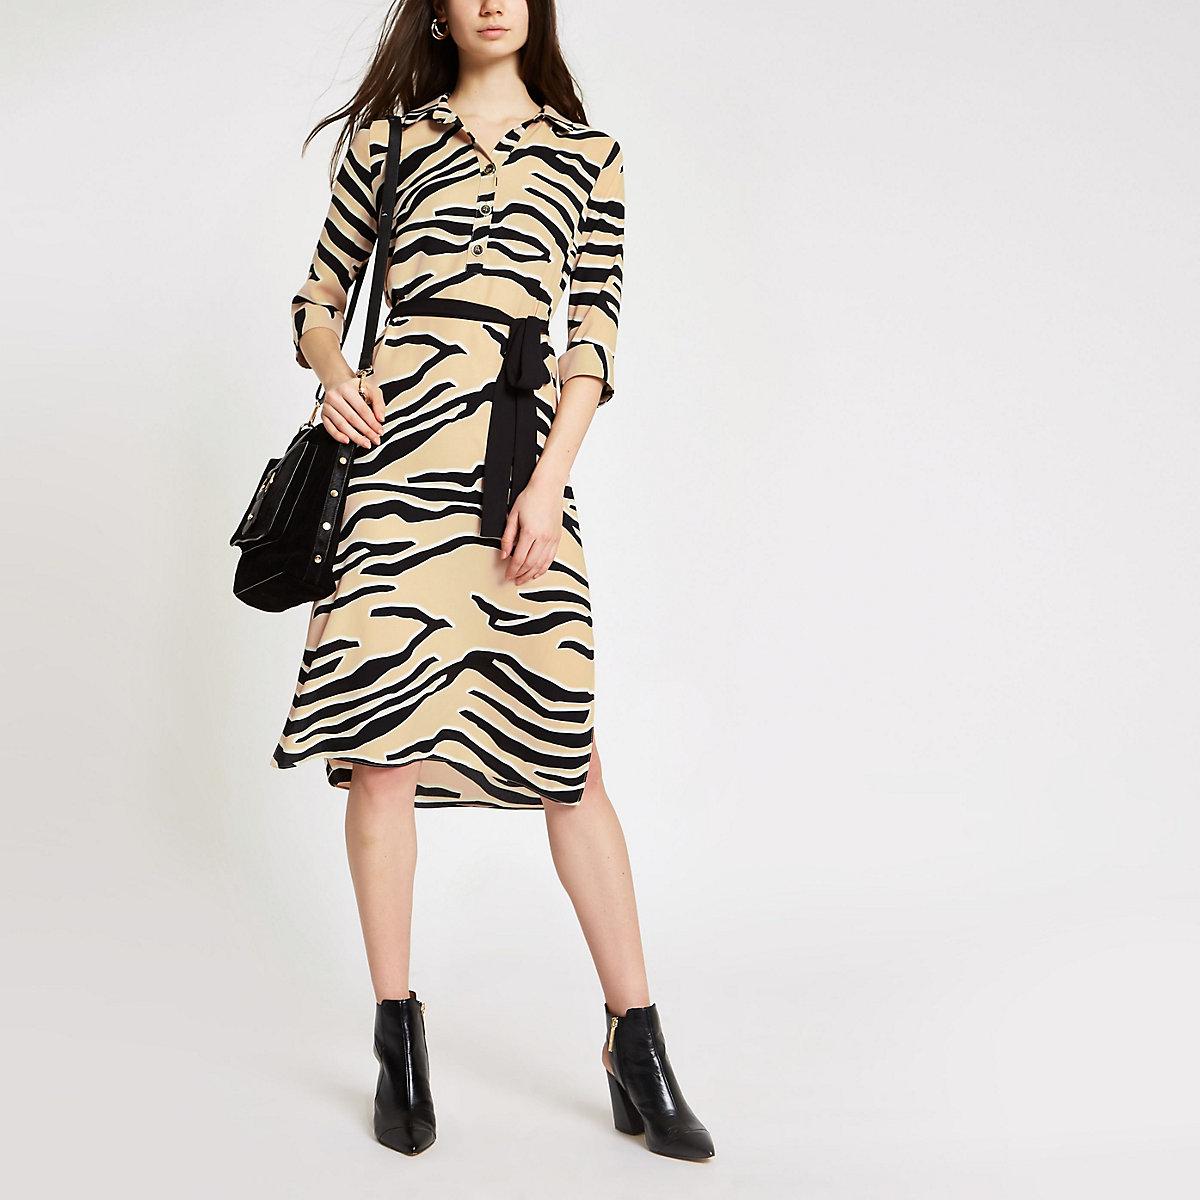 Beige zebra print shirt dress